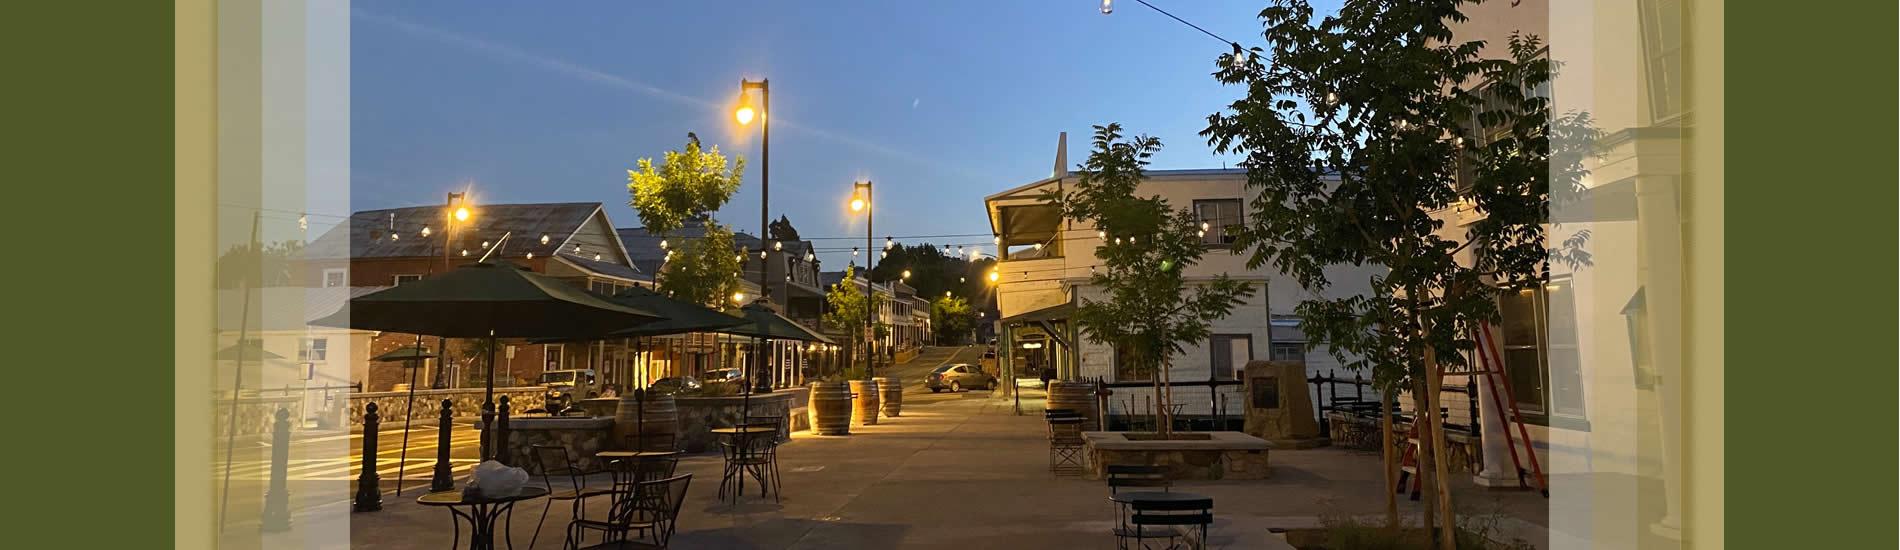 sutter creek main street at twilight